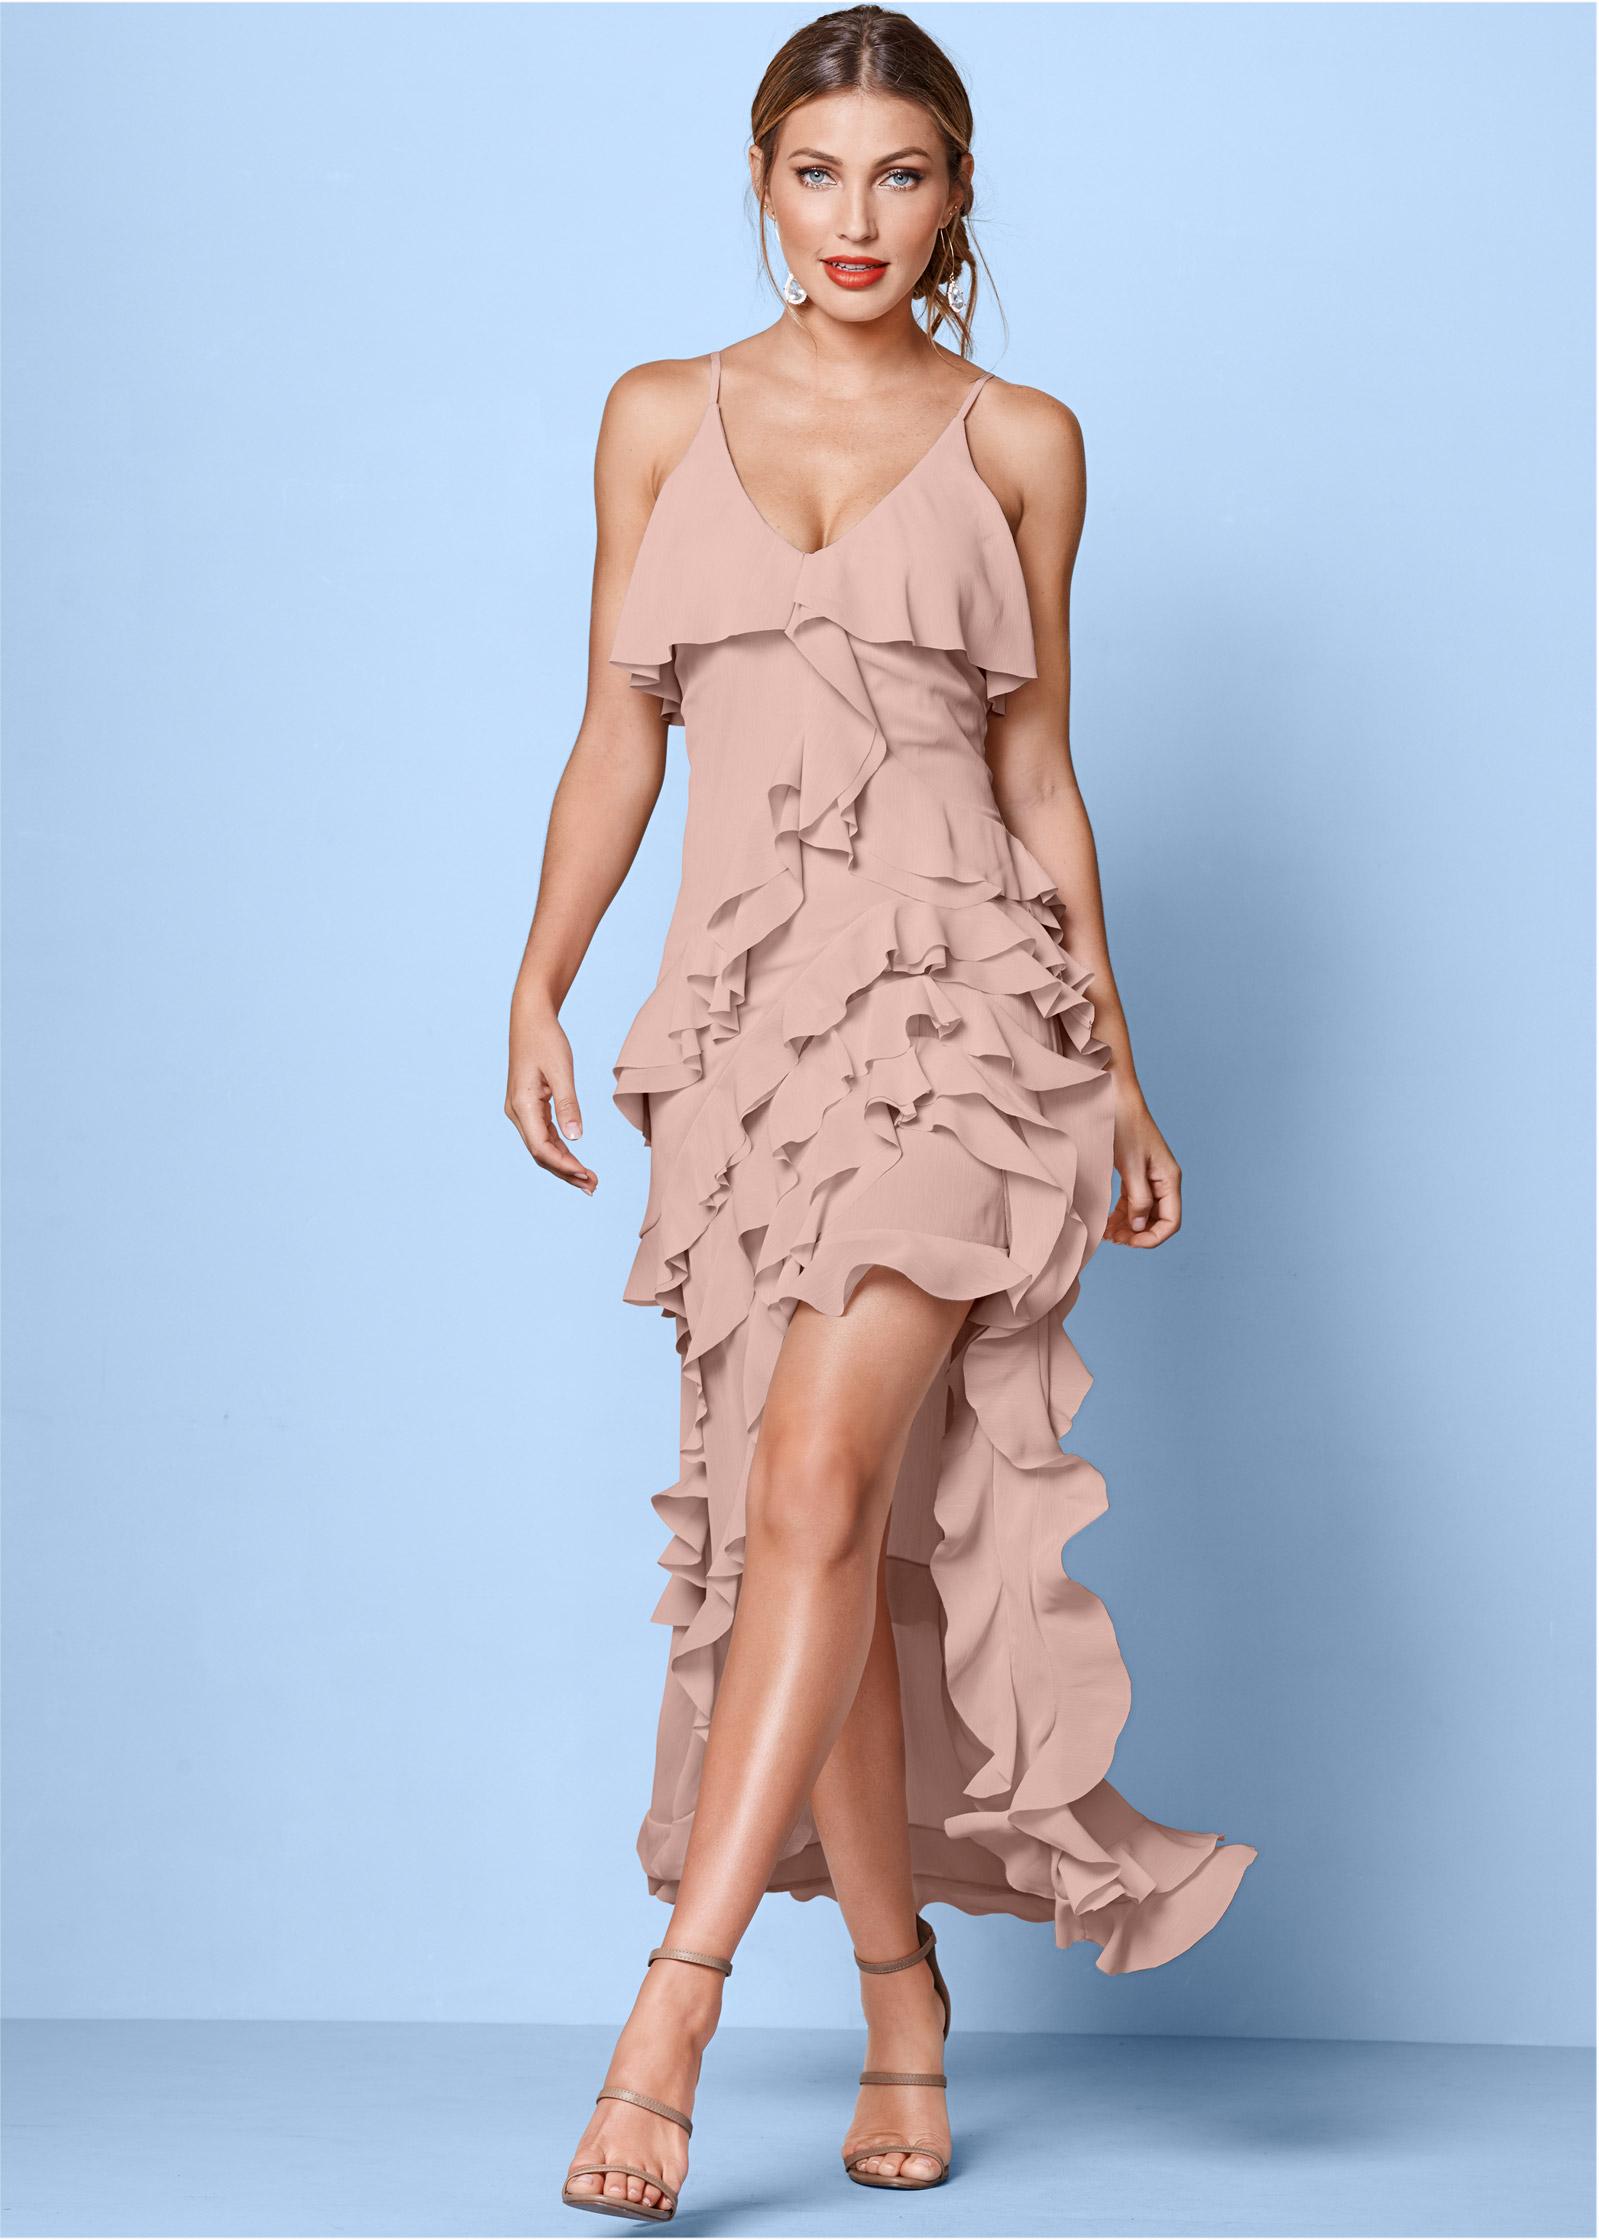 Peach RUFFLE DETAIL LONG DRESS from VENUS